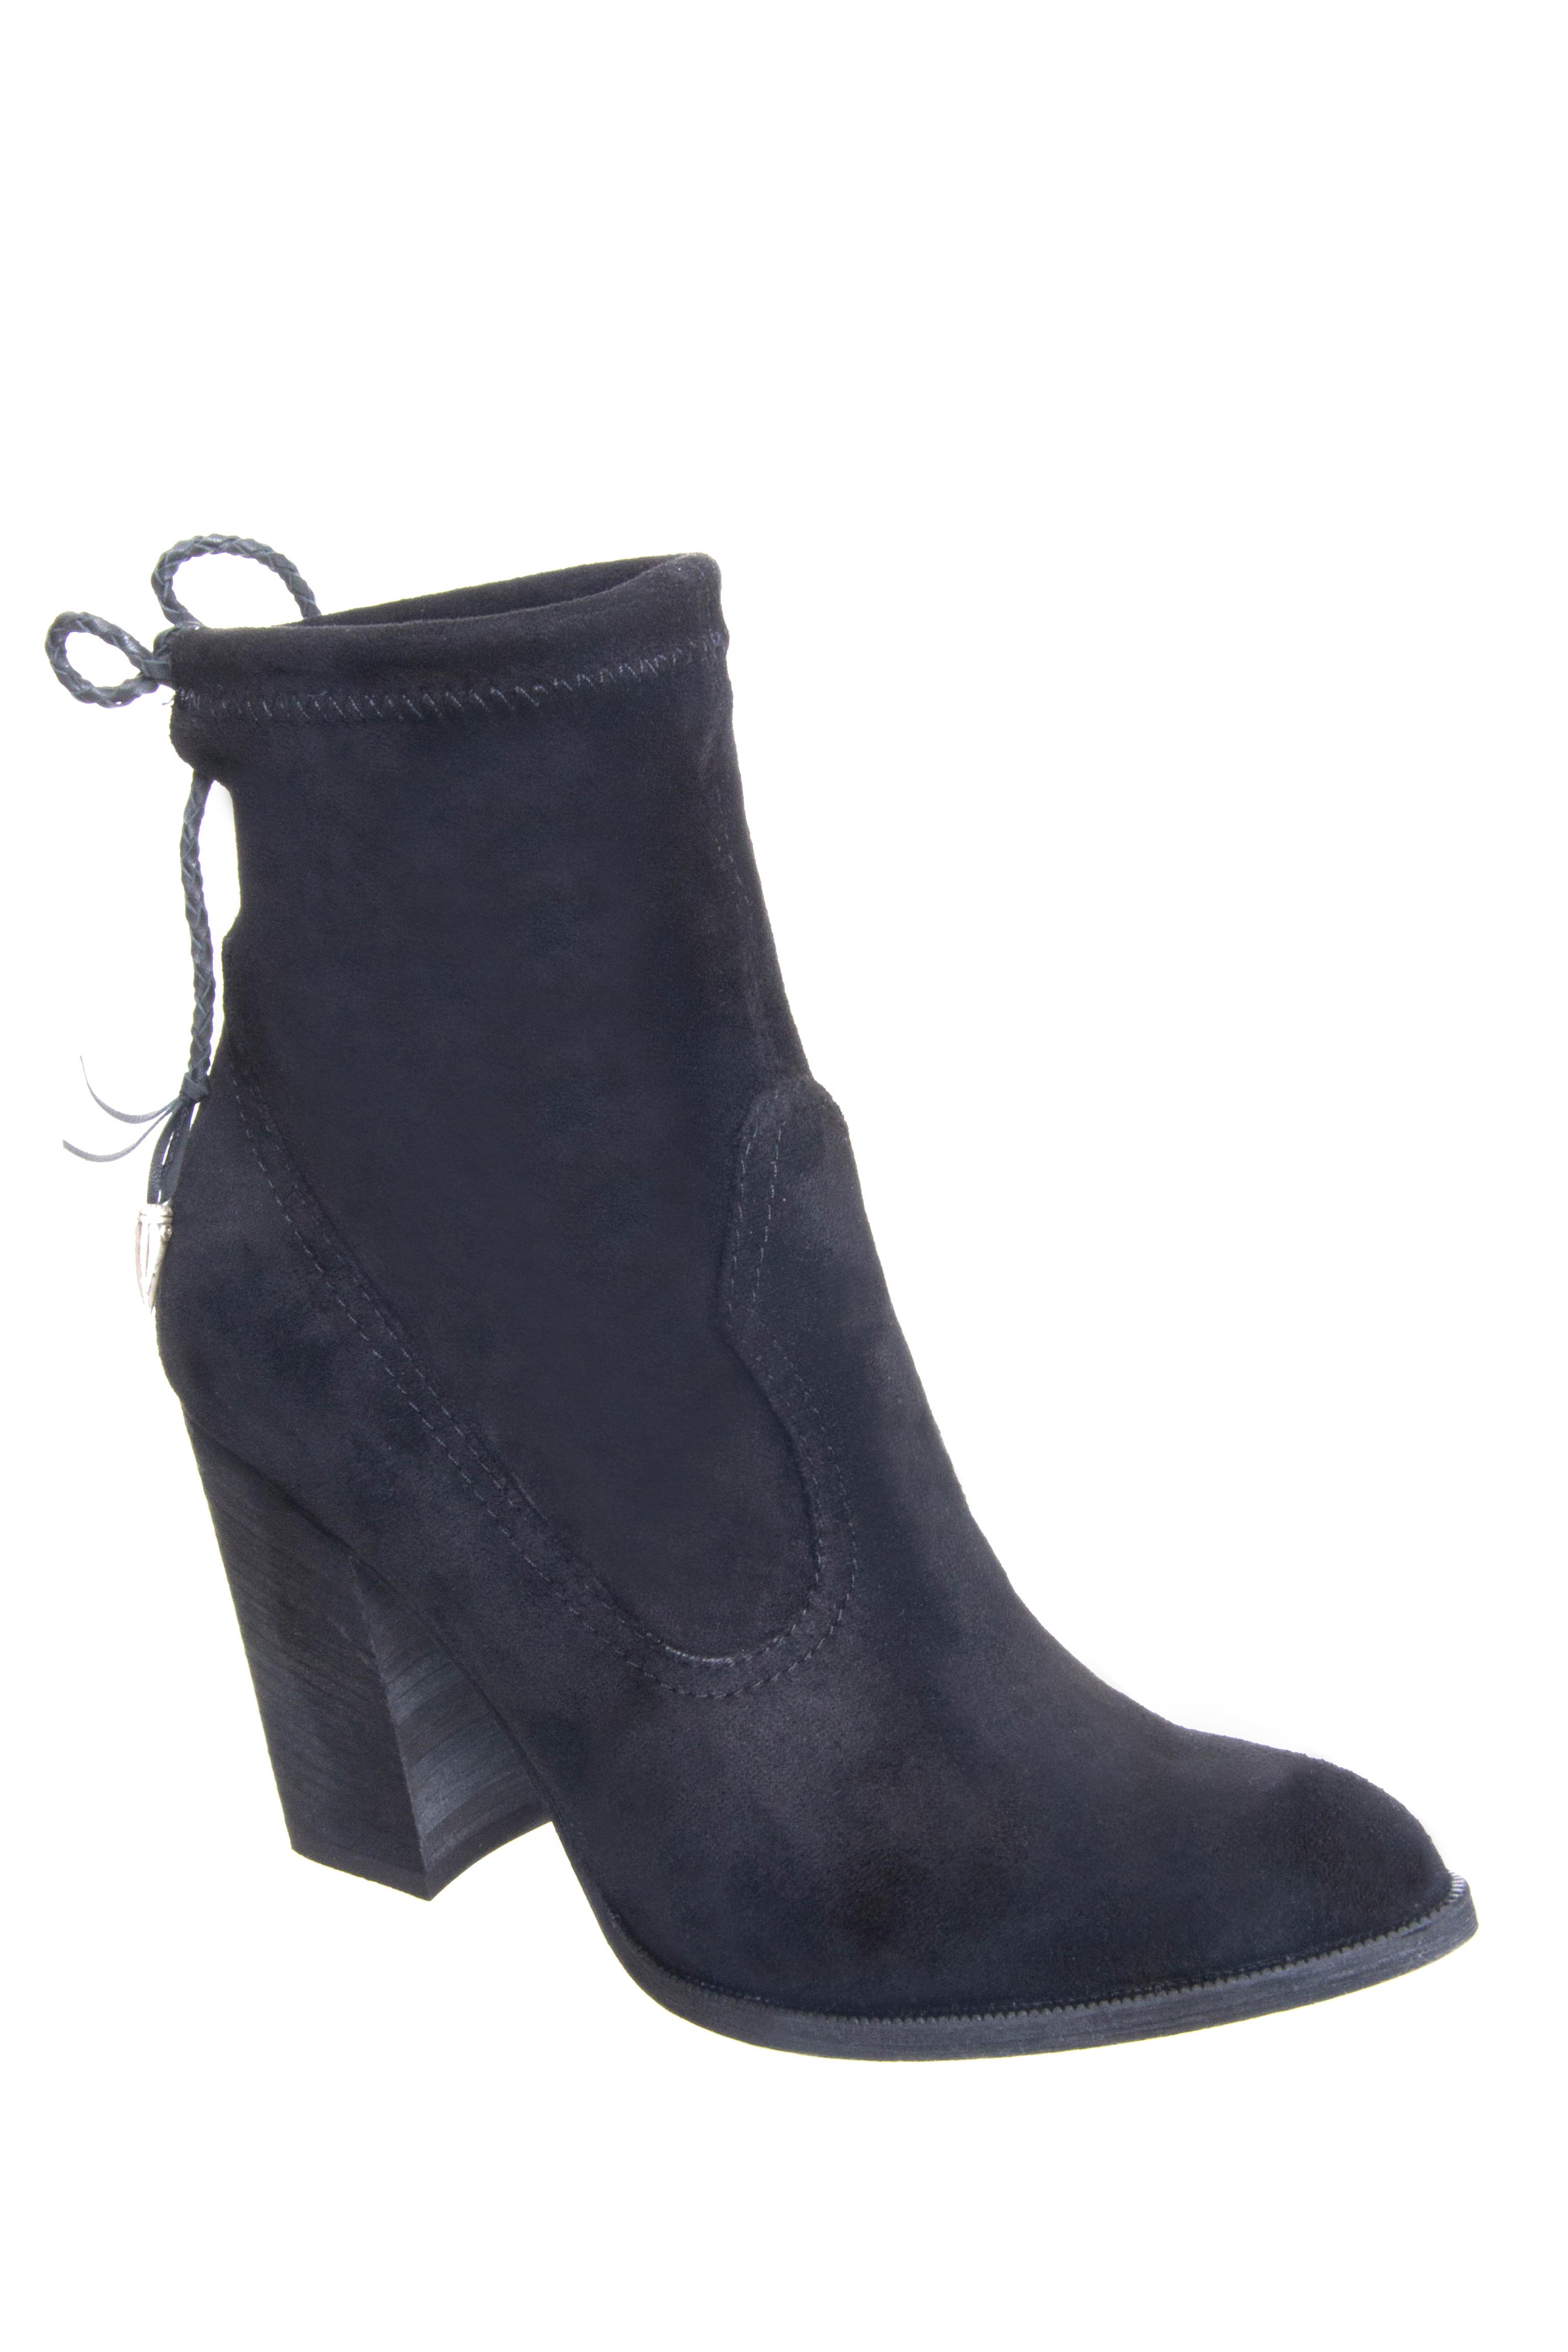 Dolce Vita Casee High Heel Boots - Black